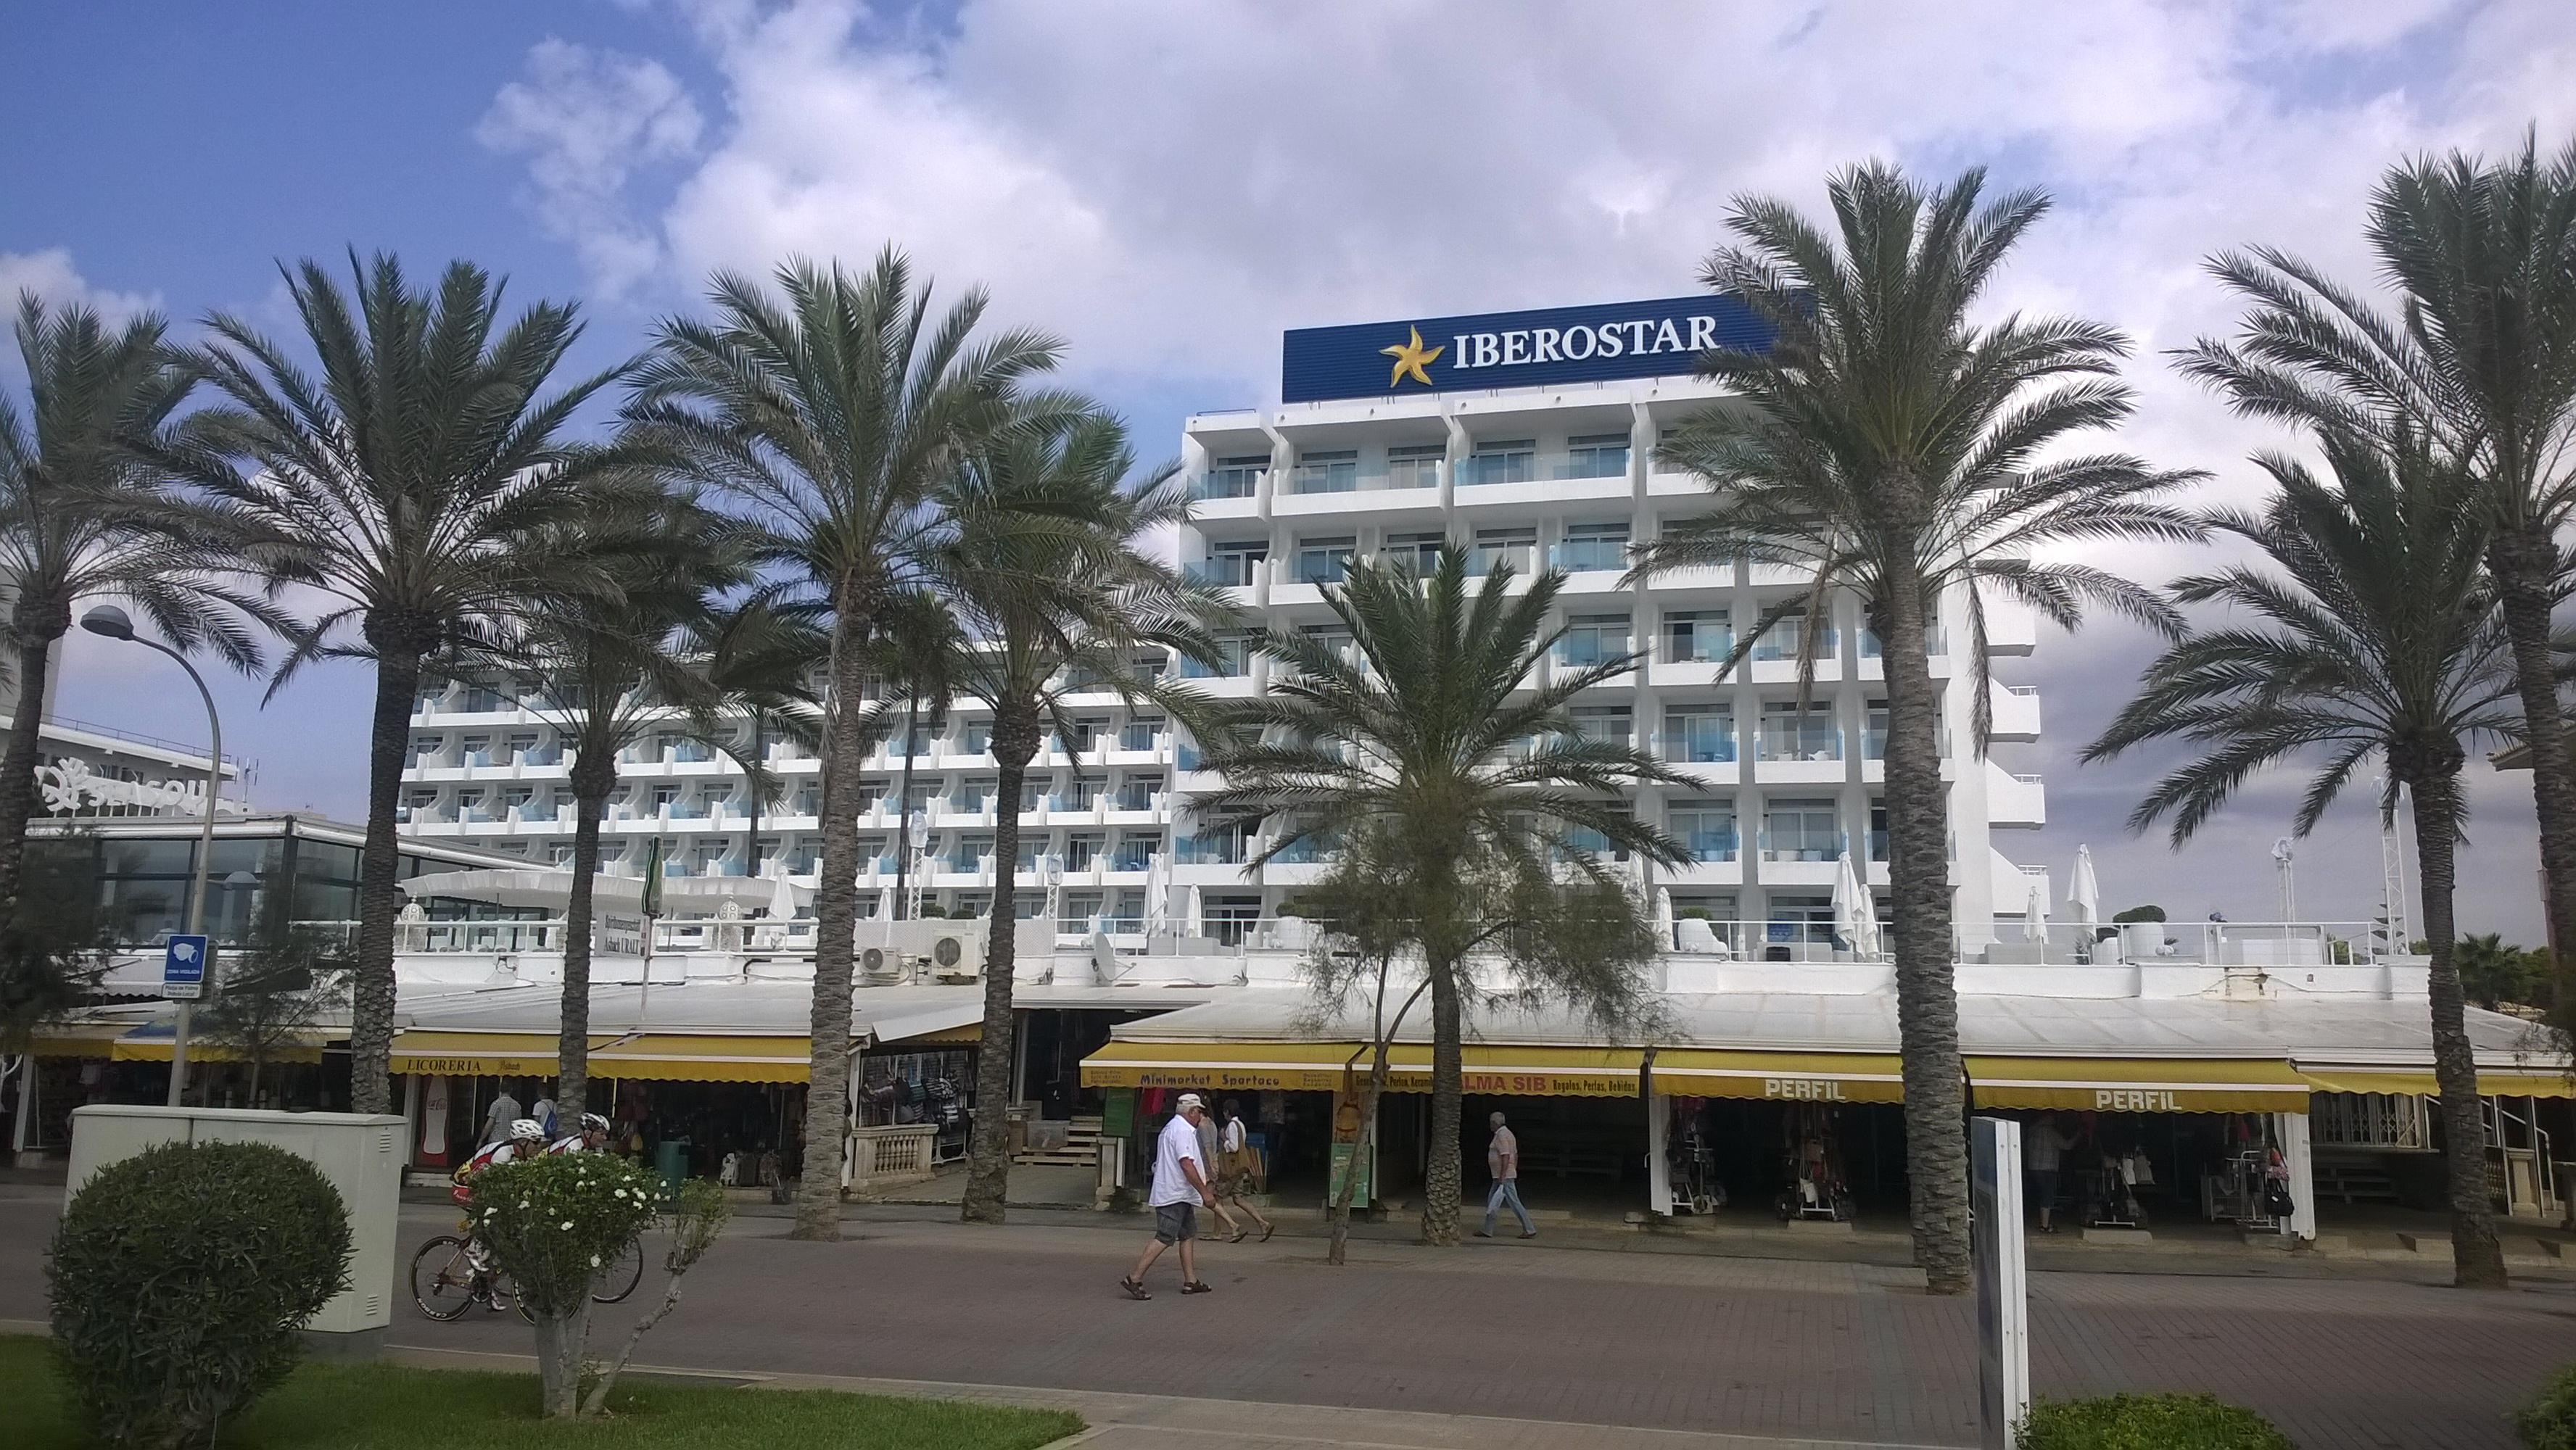 Hotel Iberostar Cupido am Ballermann